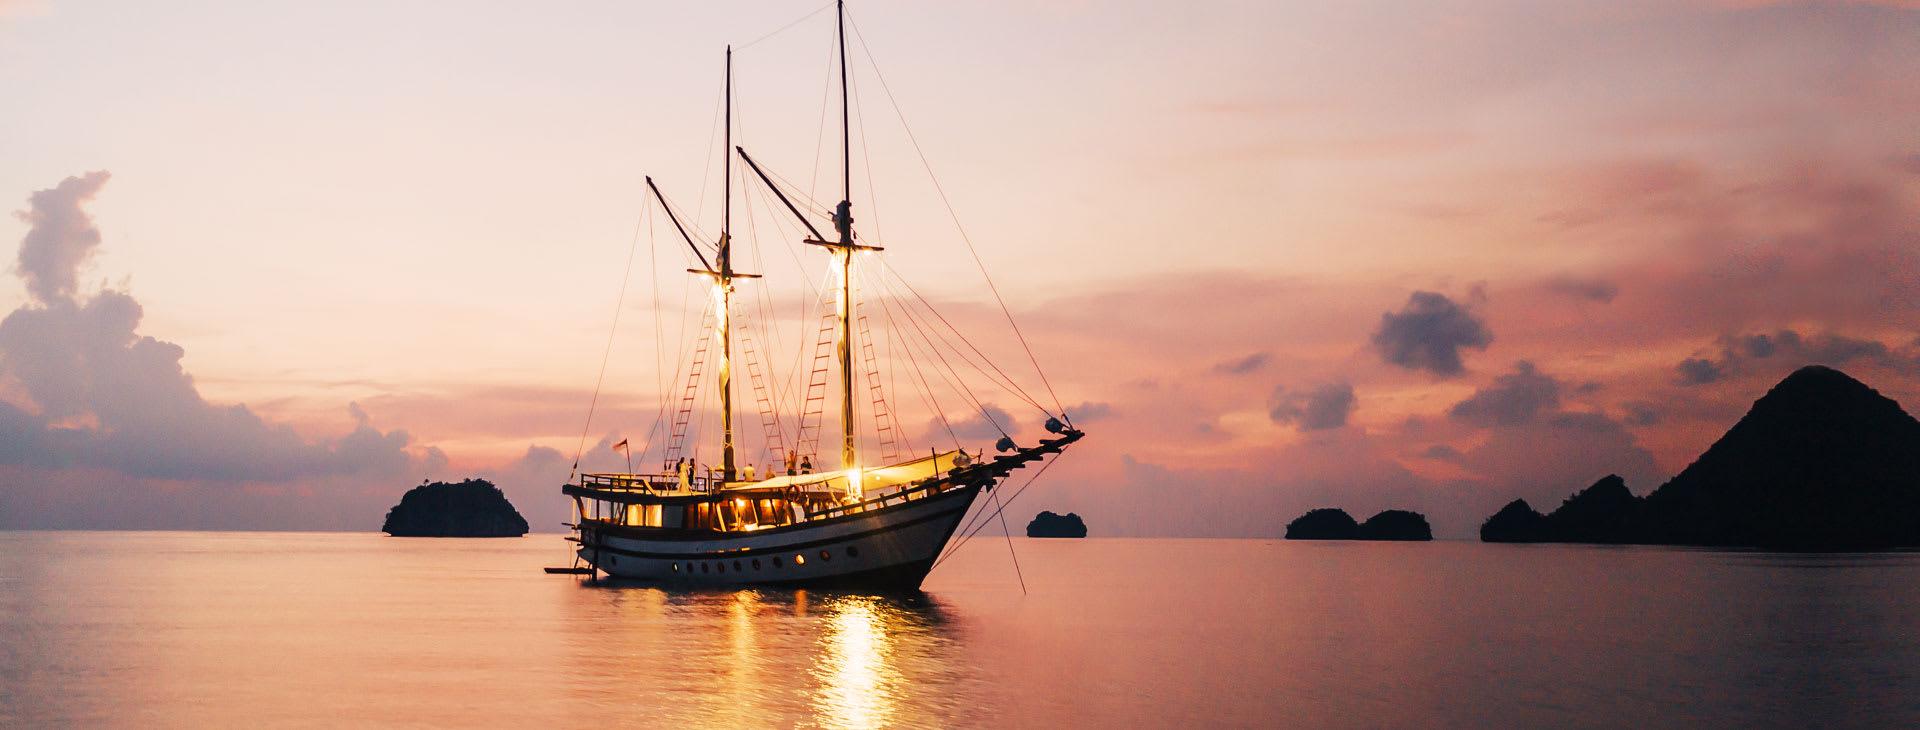 Senja Yacht in Indonesia